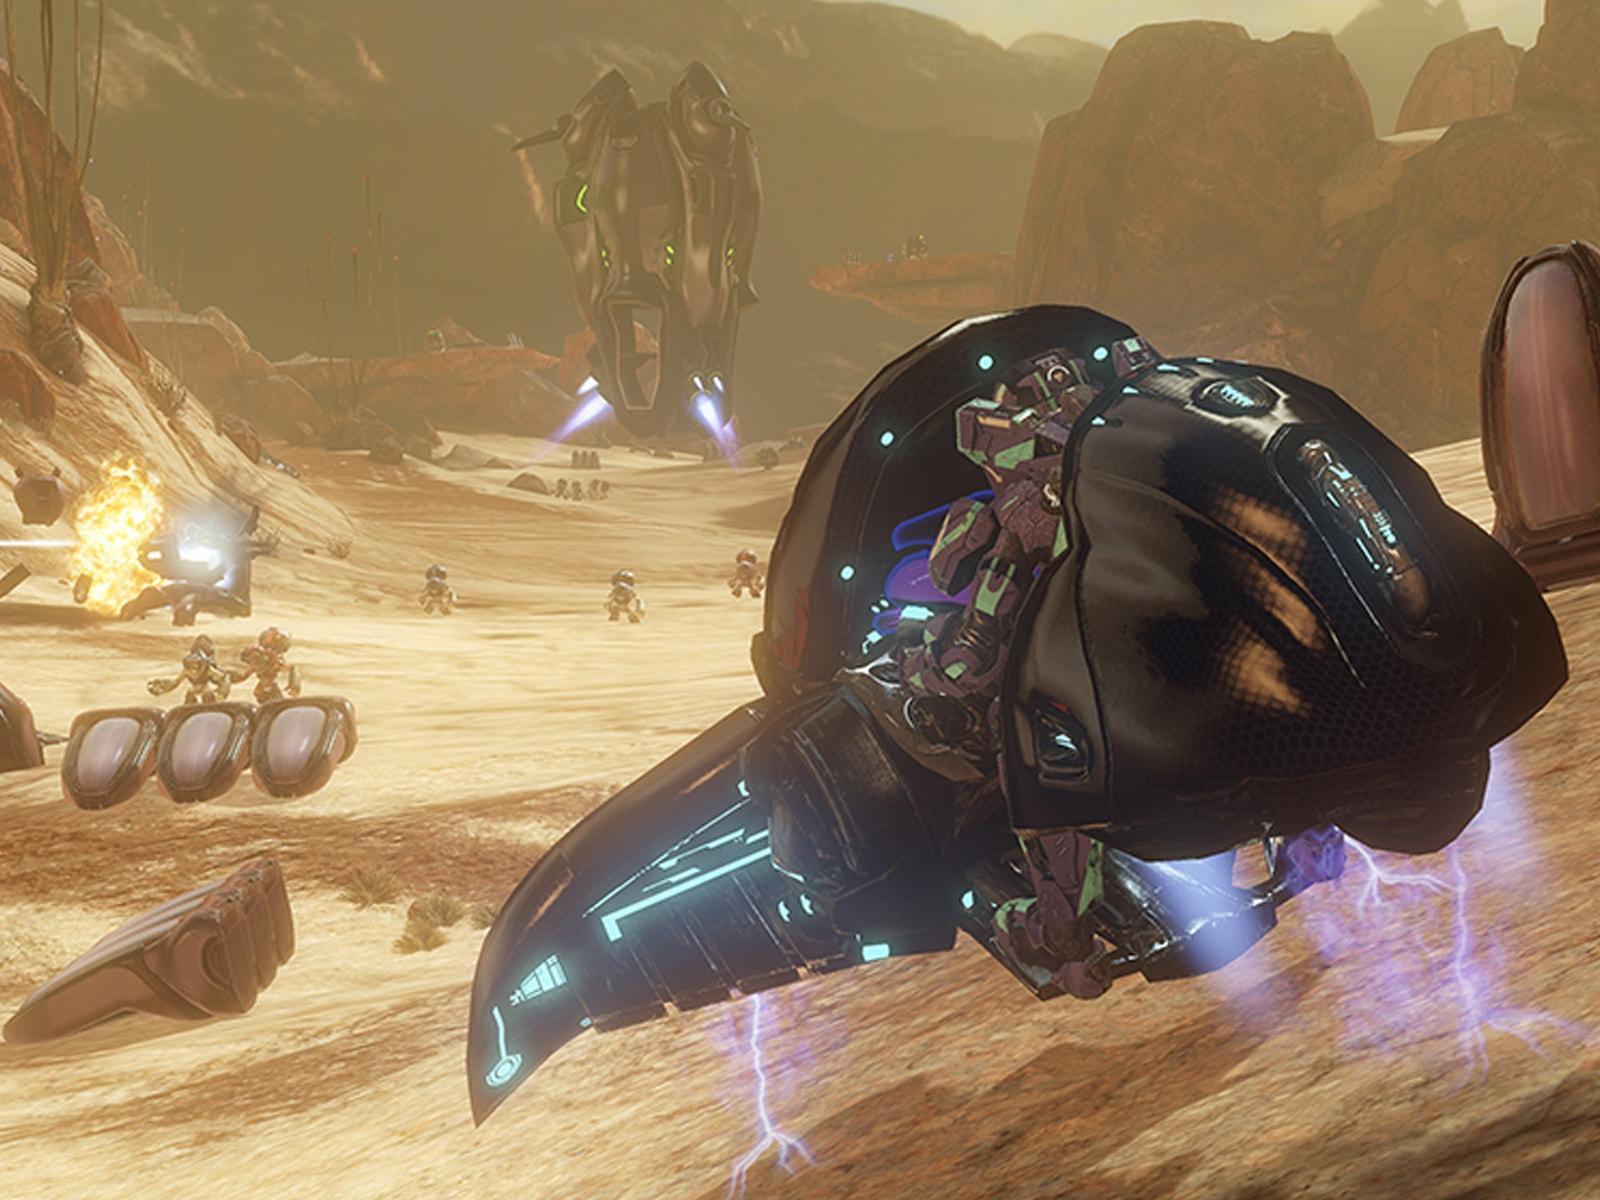 Screenshot from Halo 4 of futuristic machines flying through a mountainous desert